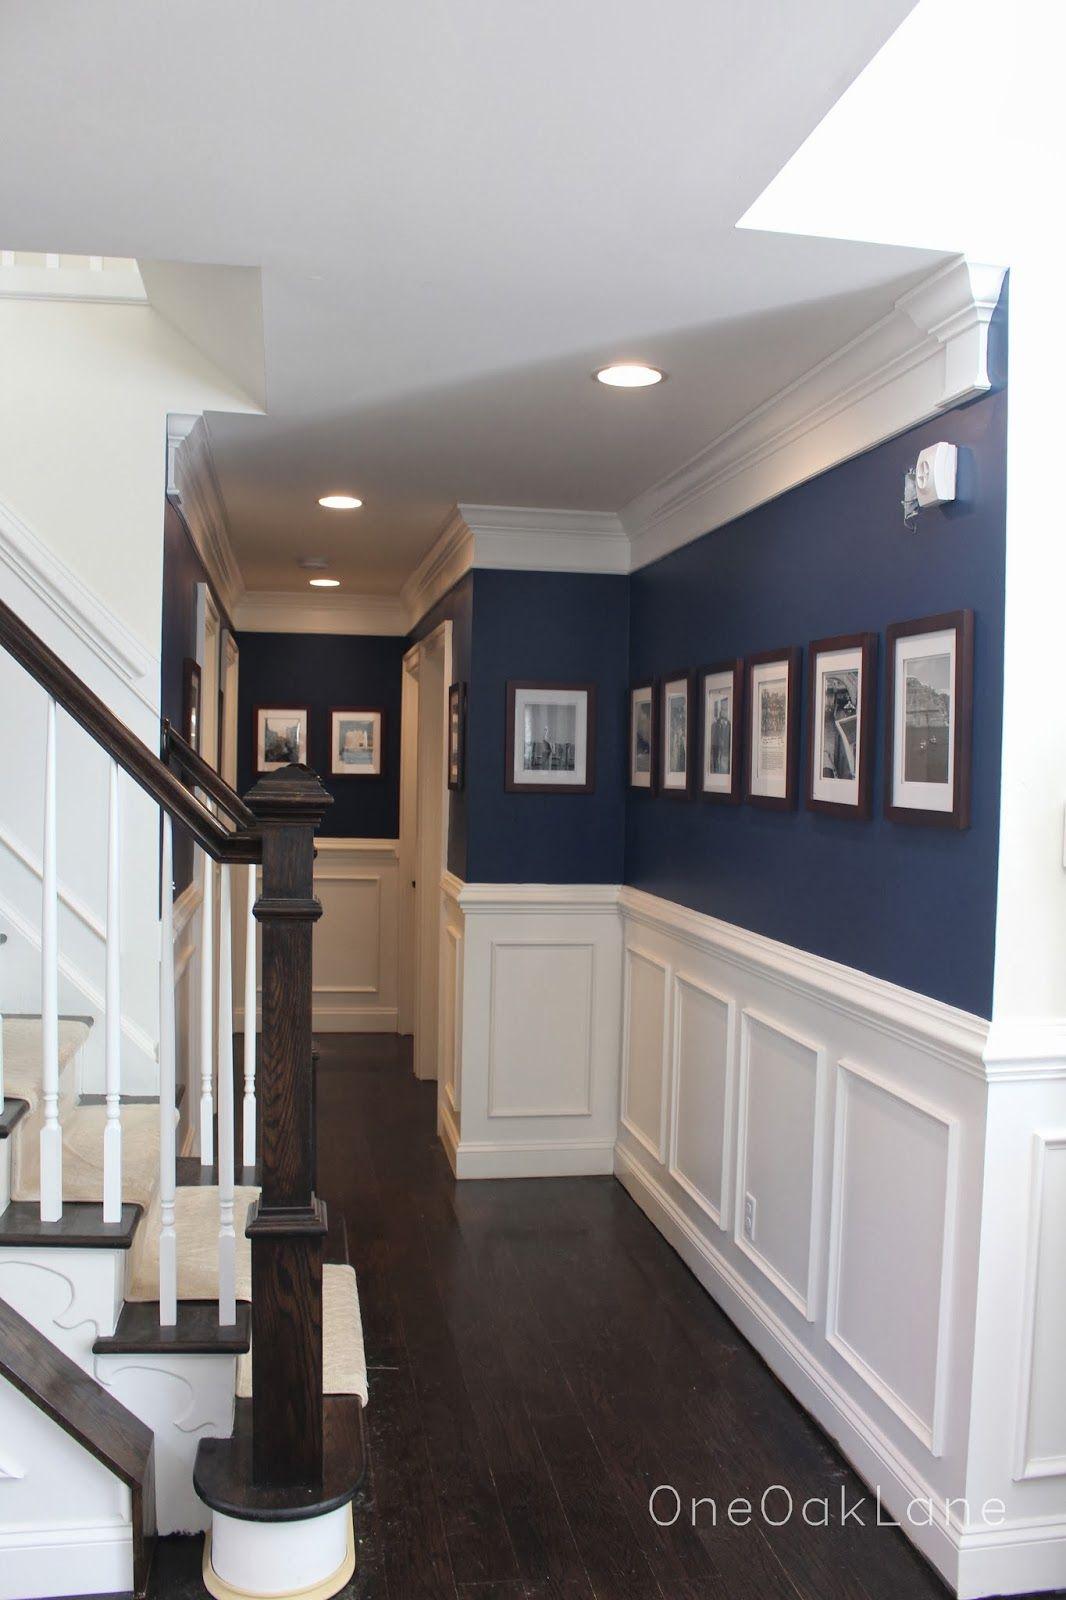 One Oak Lane: Navy Picture Hallway #hallway